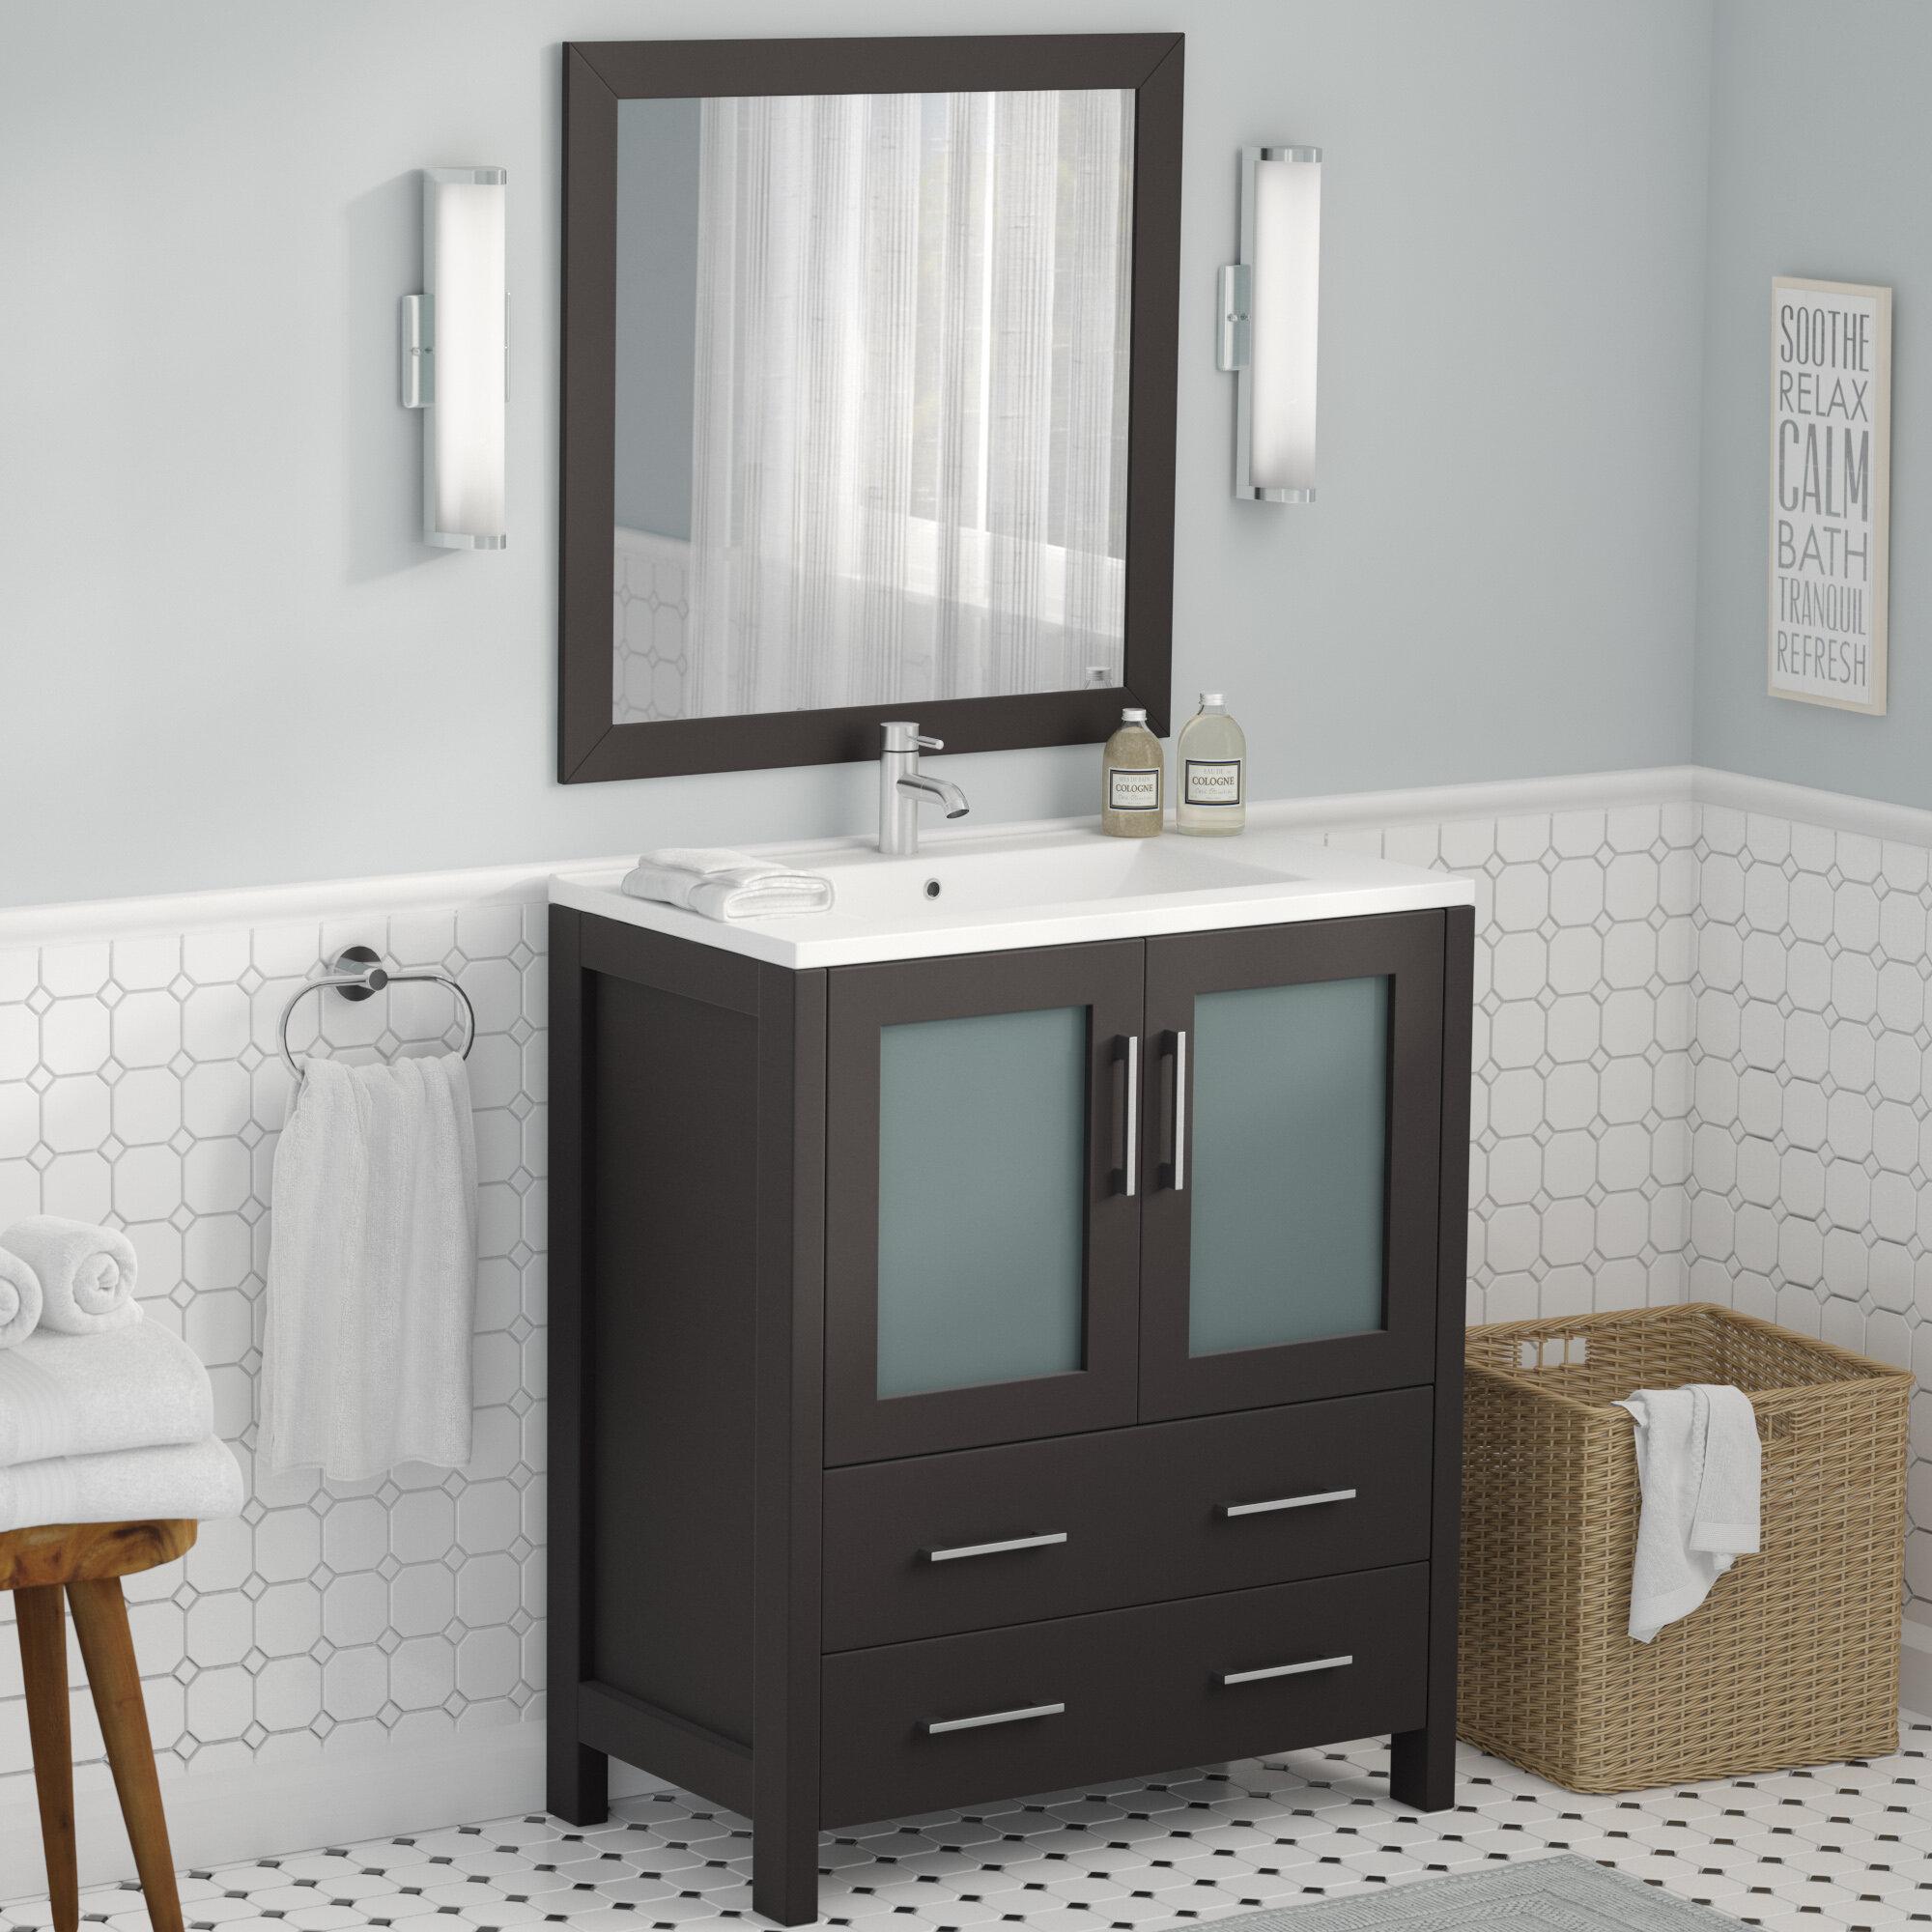 Strange Karson 30 Single Bathroom Vanity Set With Mirror Download Free Architecture Designs Scobabritishbridgeorg